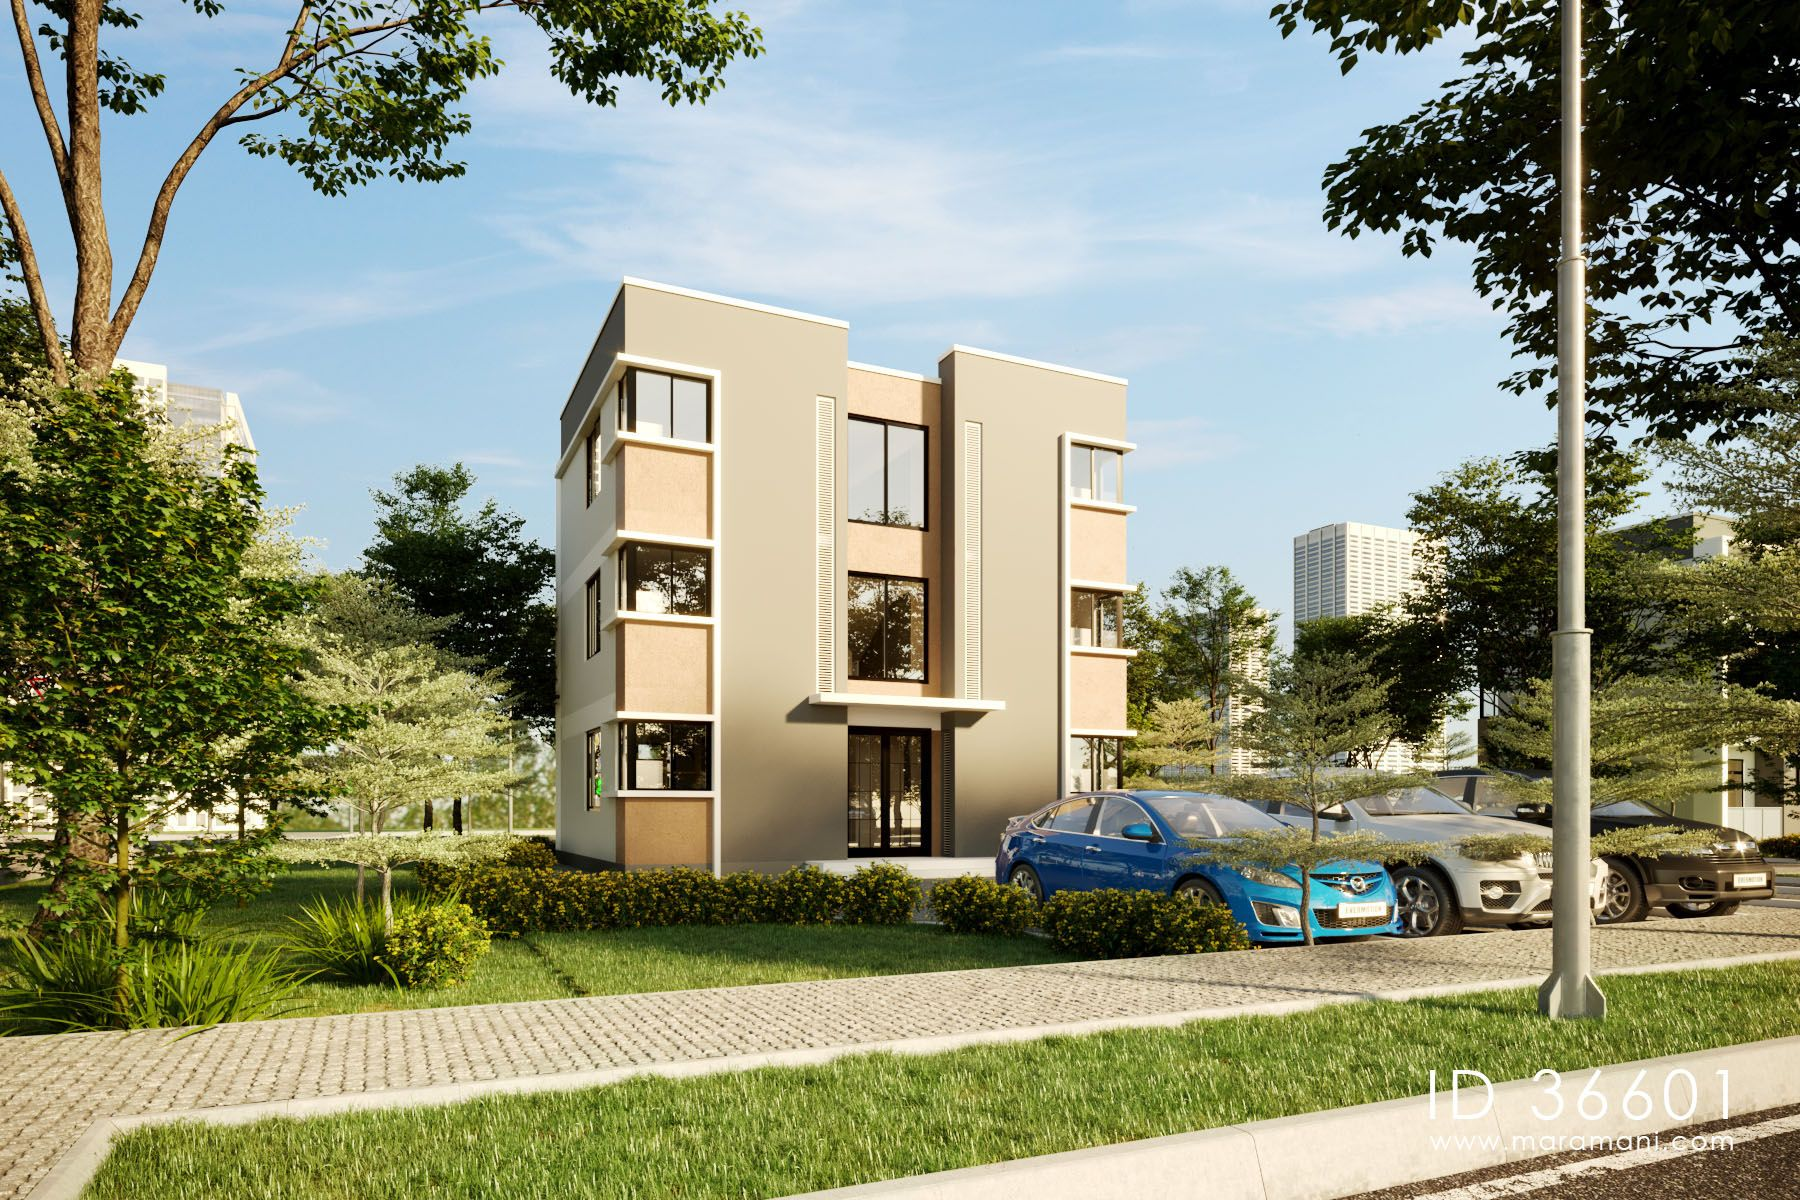 Studio Apartment Design Id 36601 House Plans By Maramani Com Studio Apartment Design Hostels Design Apartment Plans